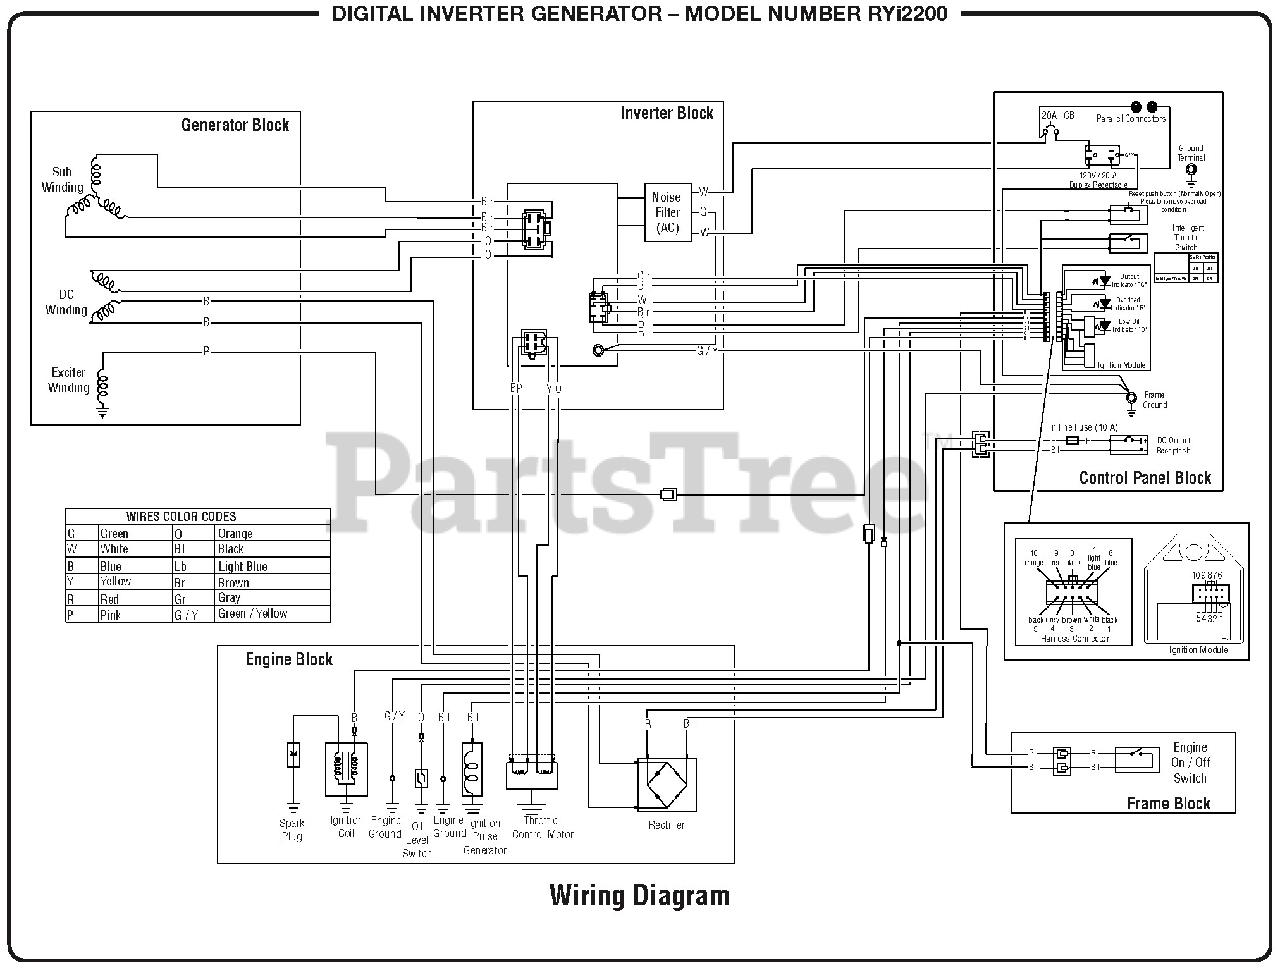 Model A Wiring Diagram : Light Switch Wiring Diagram